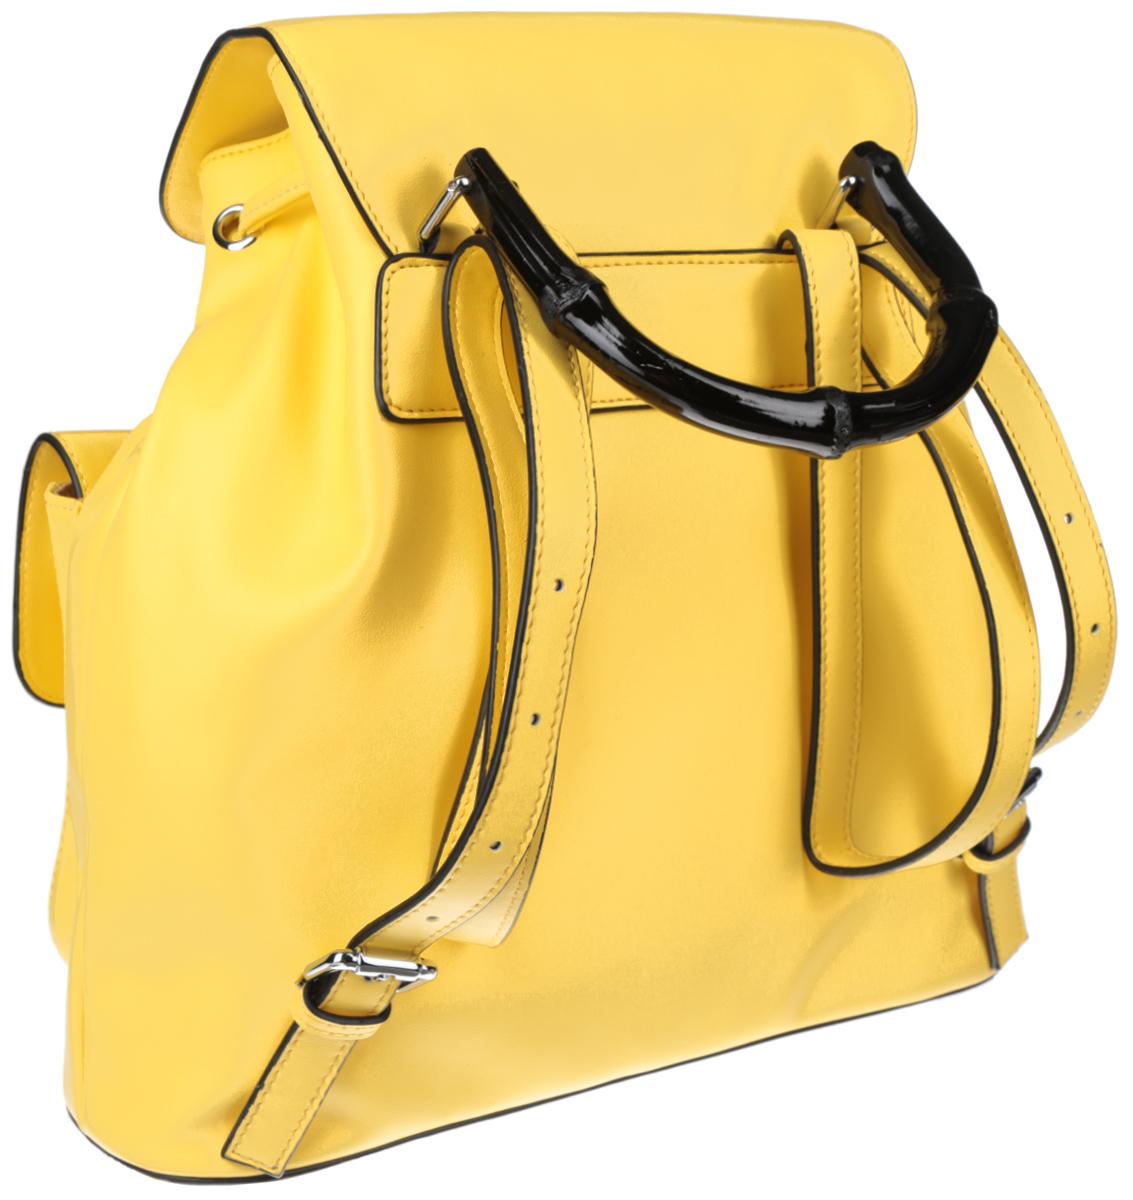 Рюкзак женский Vitacci, цвет: желтый. PDJ-2015-02B